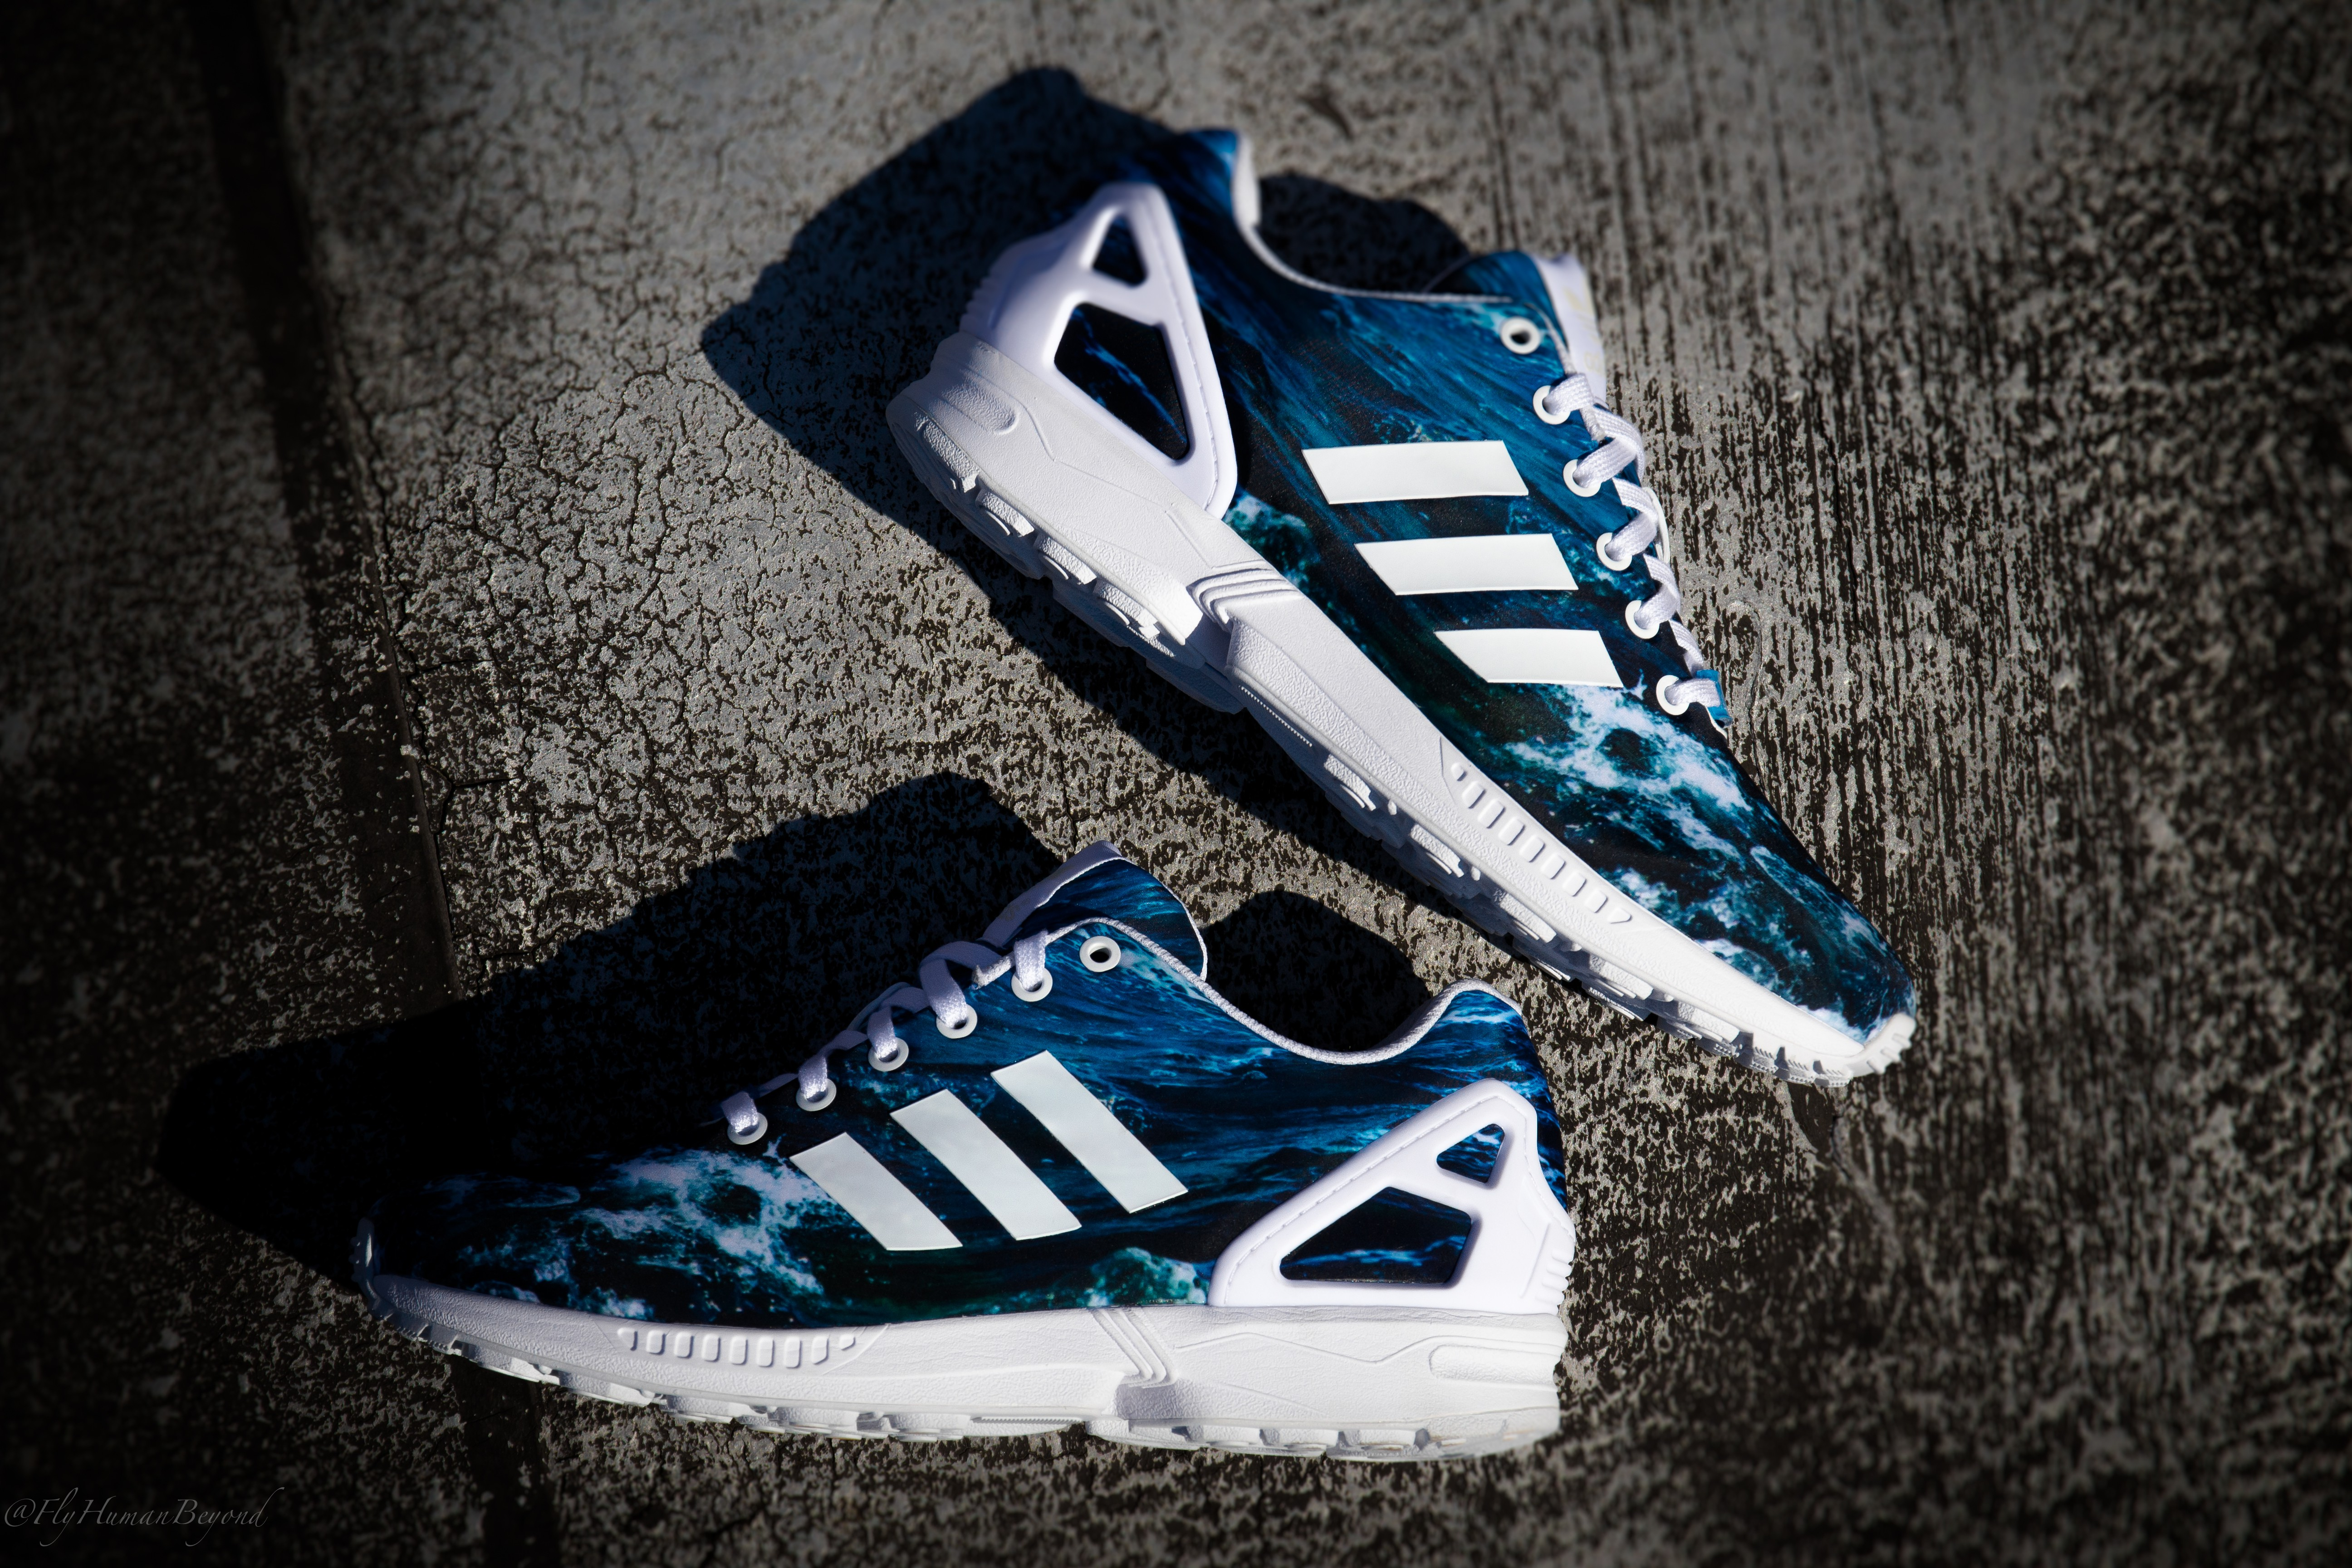 Adidas Zx Flux Printemps 2014 Release Reminder Page 2